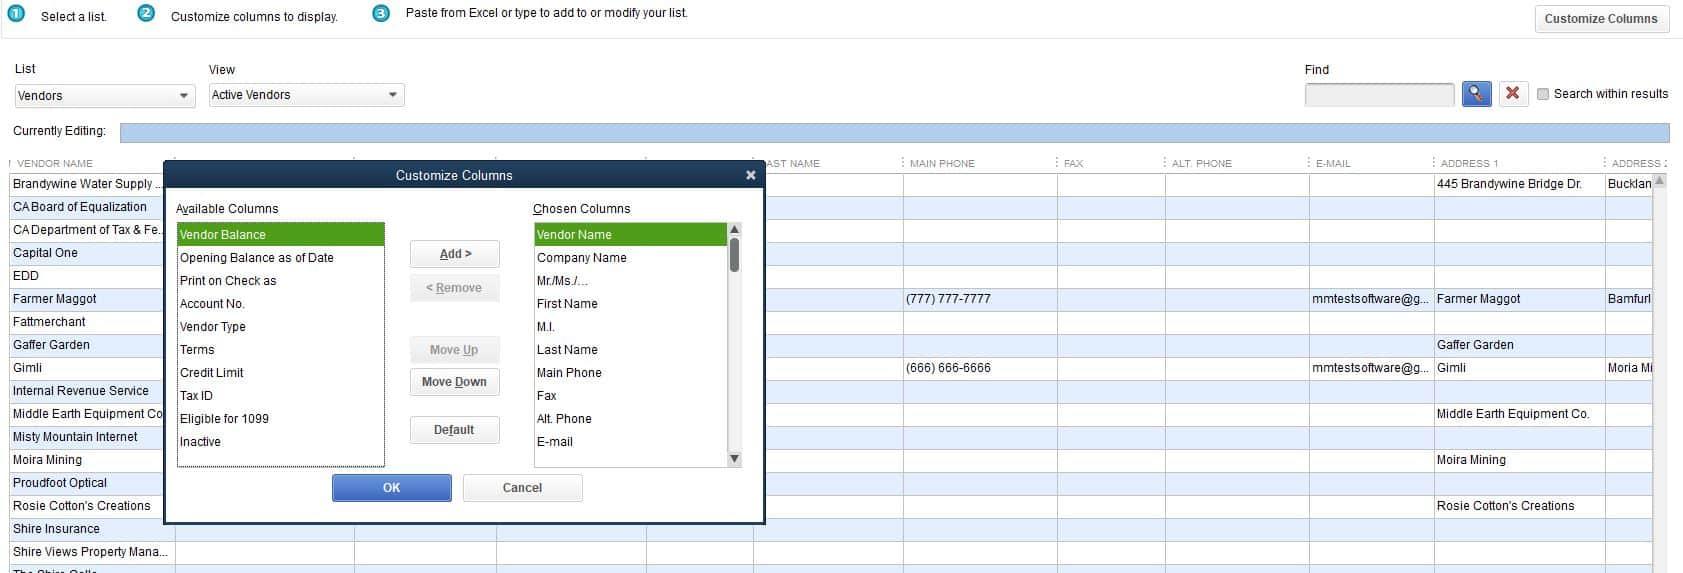 Tax IDs in QuickBooks Pro